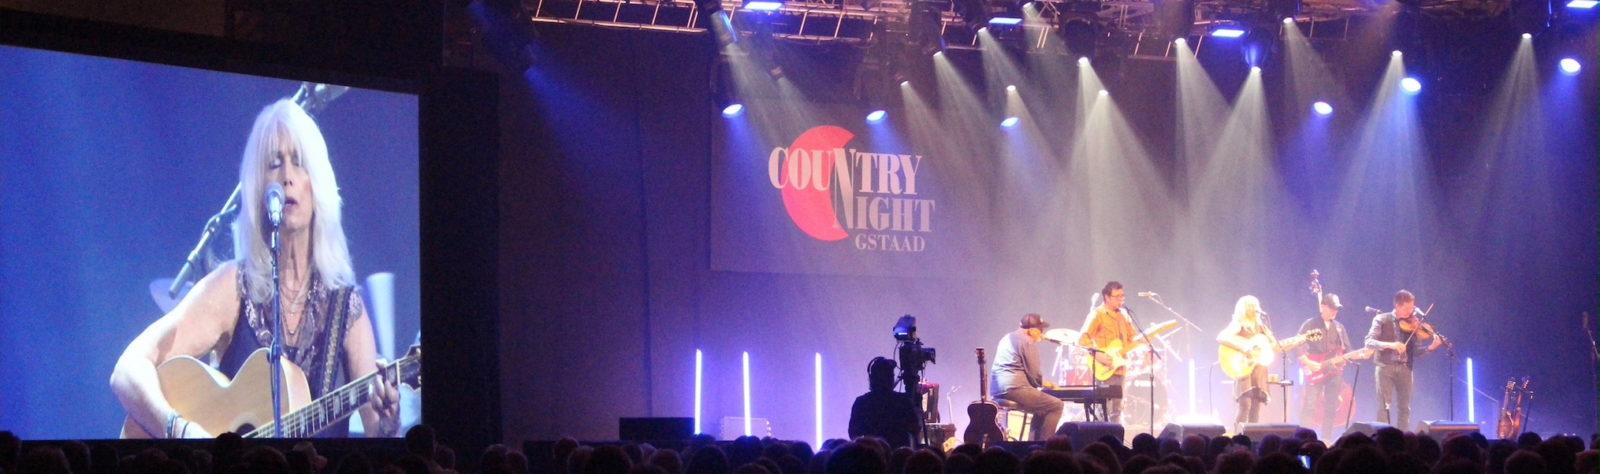 Country Night Gstaad  - concert Emmylou Harris - grande scène